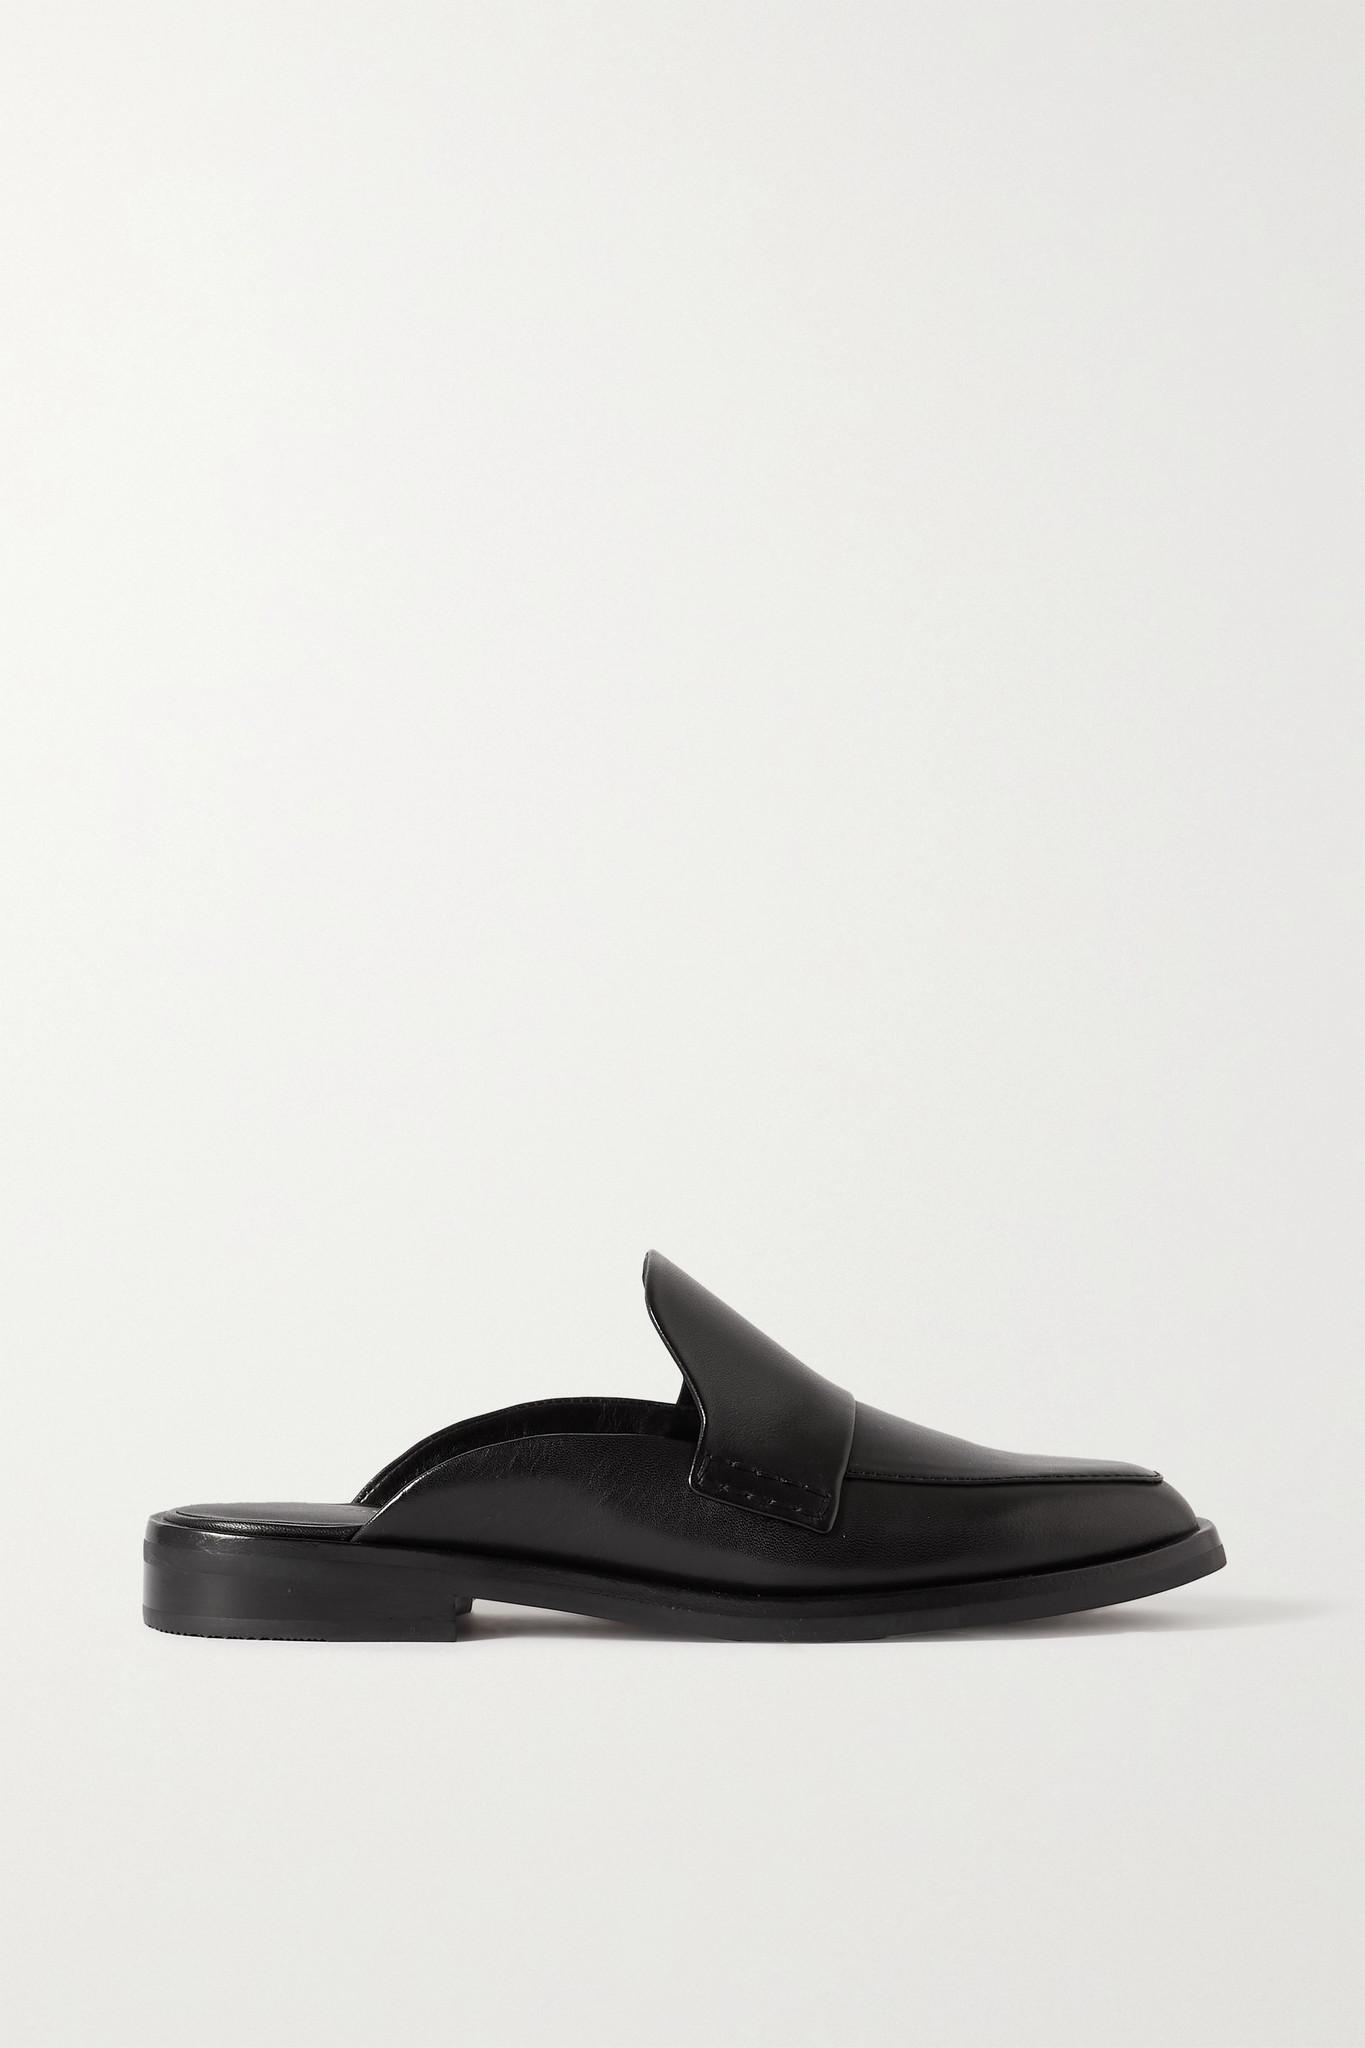 3.1 PHILLIP LIM - Alexa 皮革拖鞋 - 黑色 - IT39